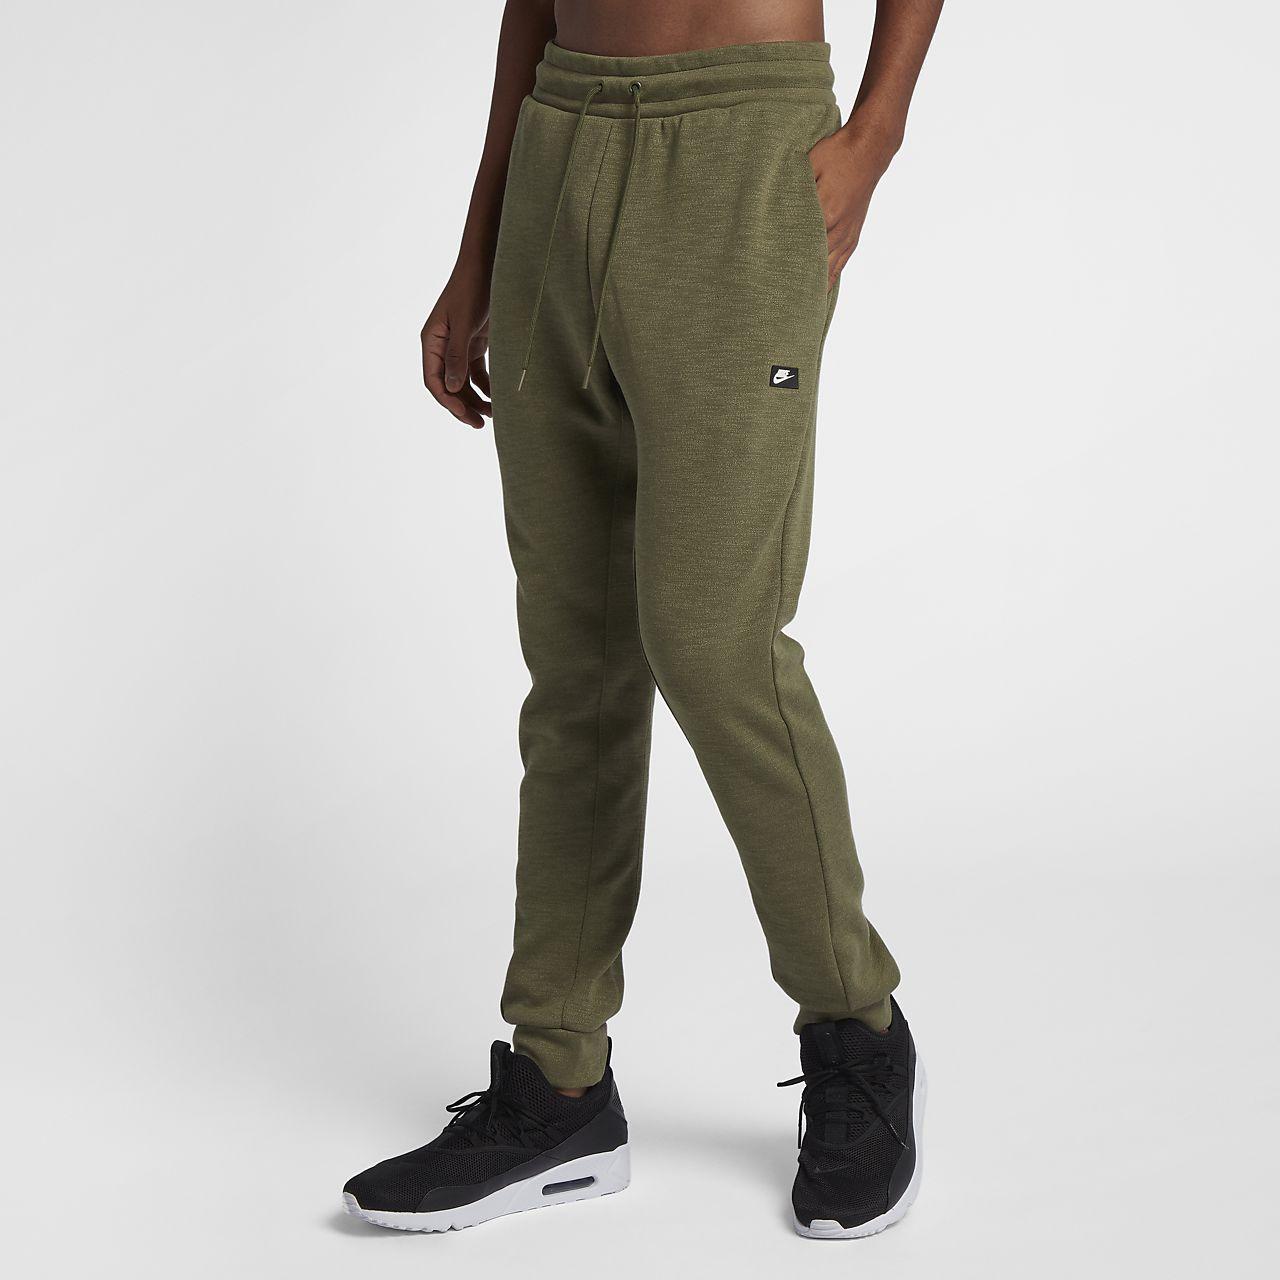 huge selection of 8903c a7435 Nike Sportswear Men s Joggers. Nike.com NO